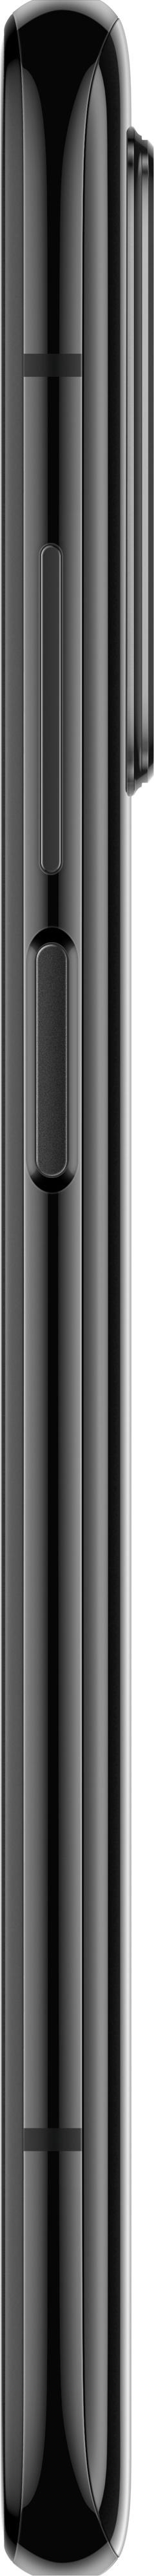 Xiaomi Puhelimet